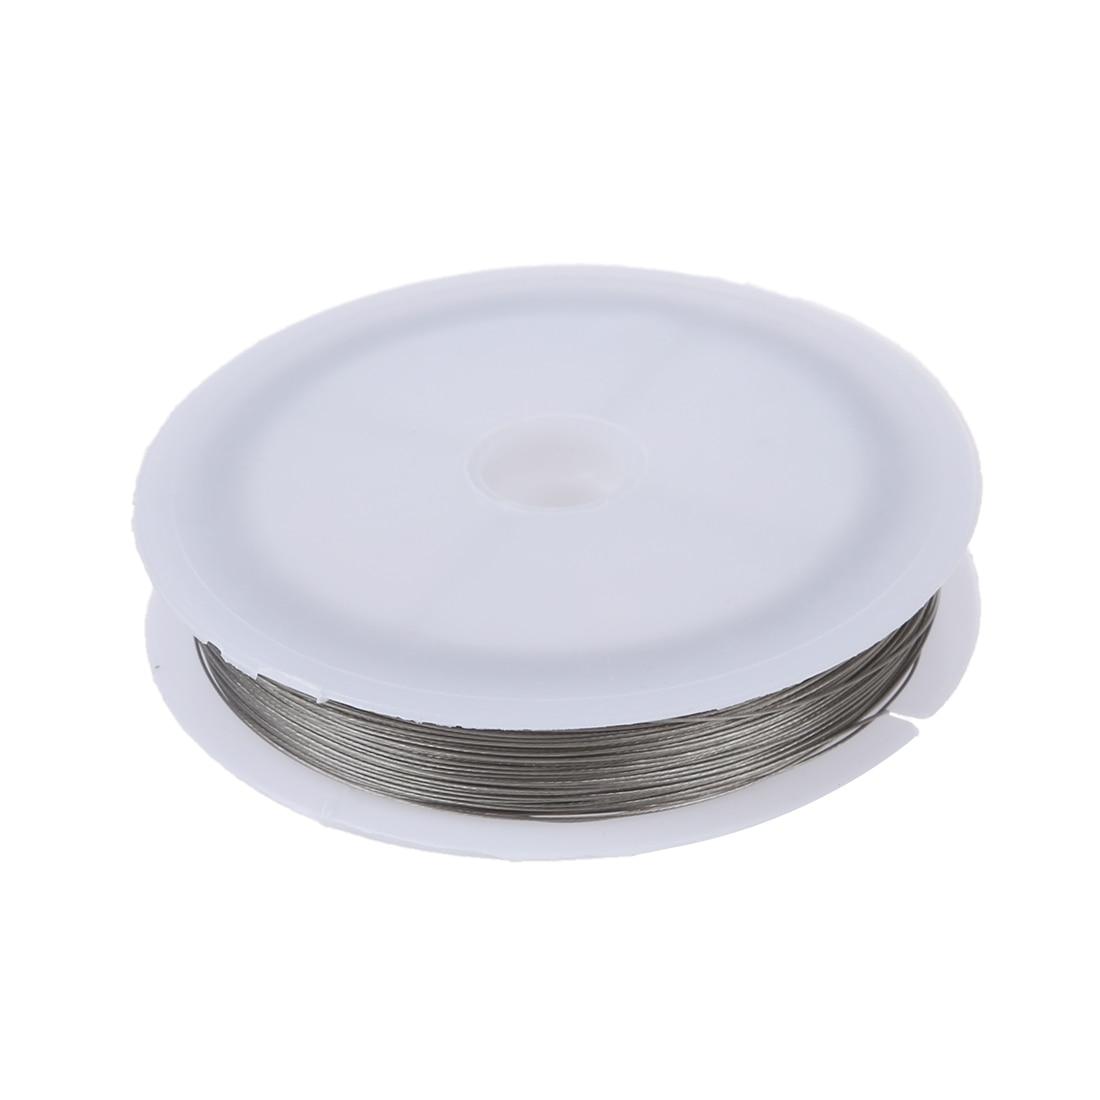 0.1 mm 5x Perles fil aiguilles Enfile Enfilage Perles /& PERLES-Extra Fine